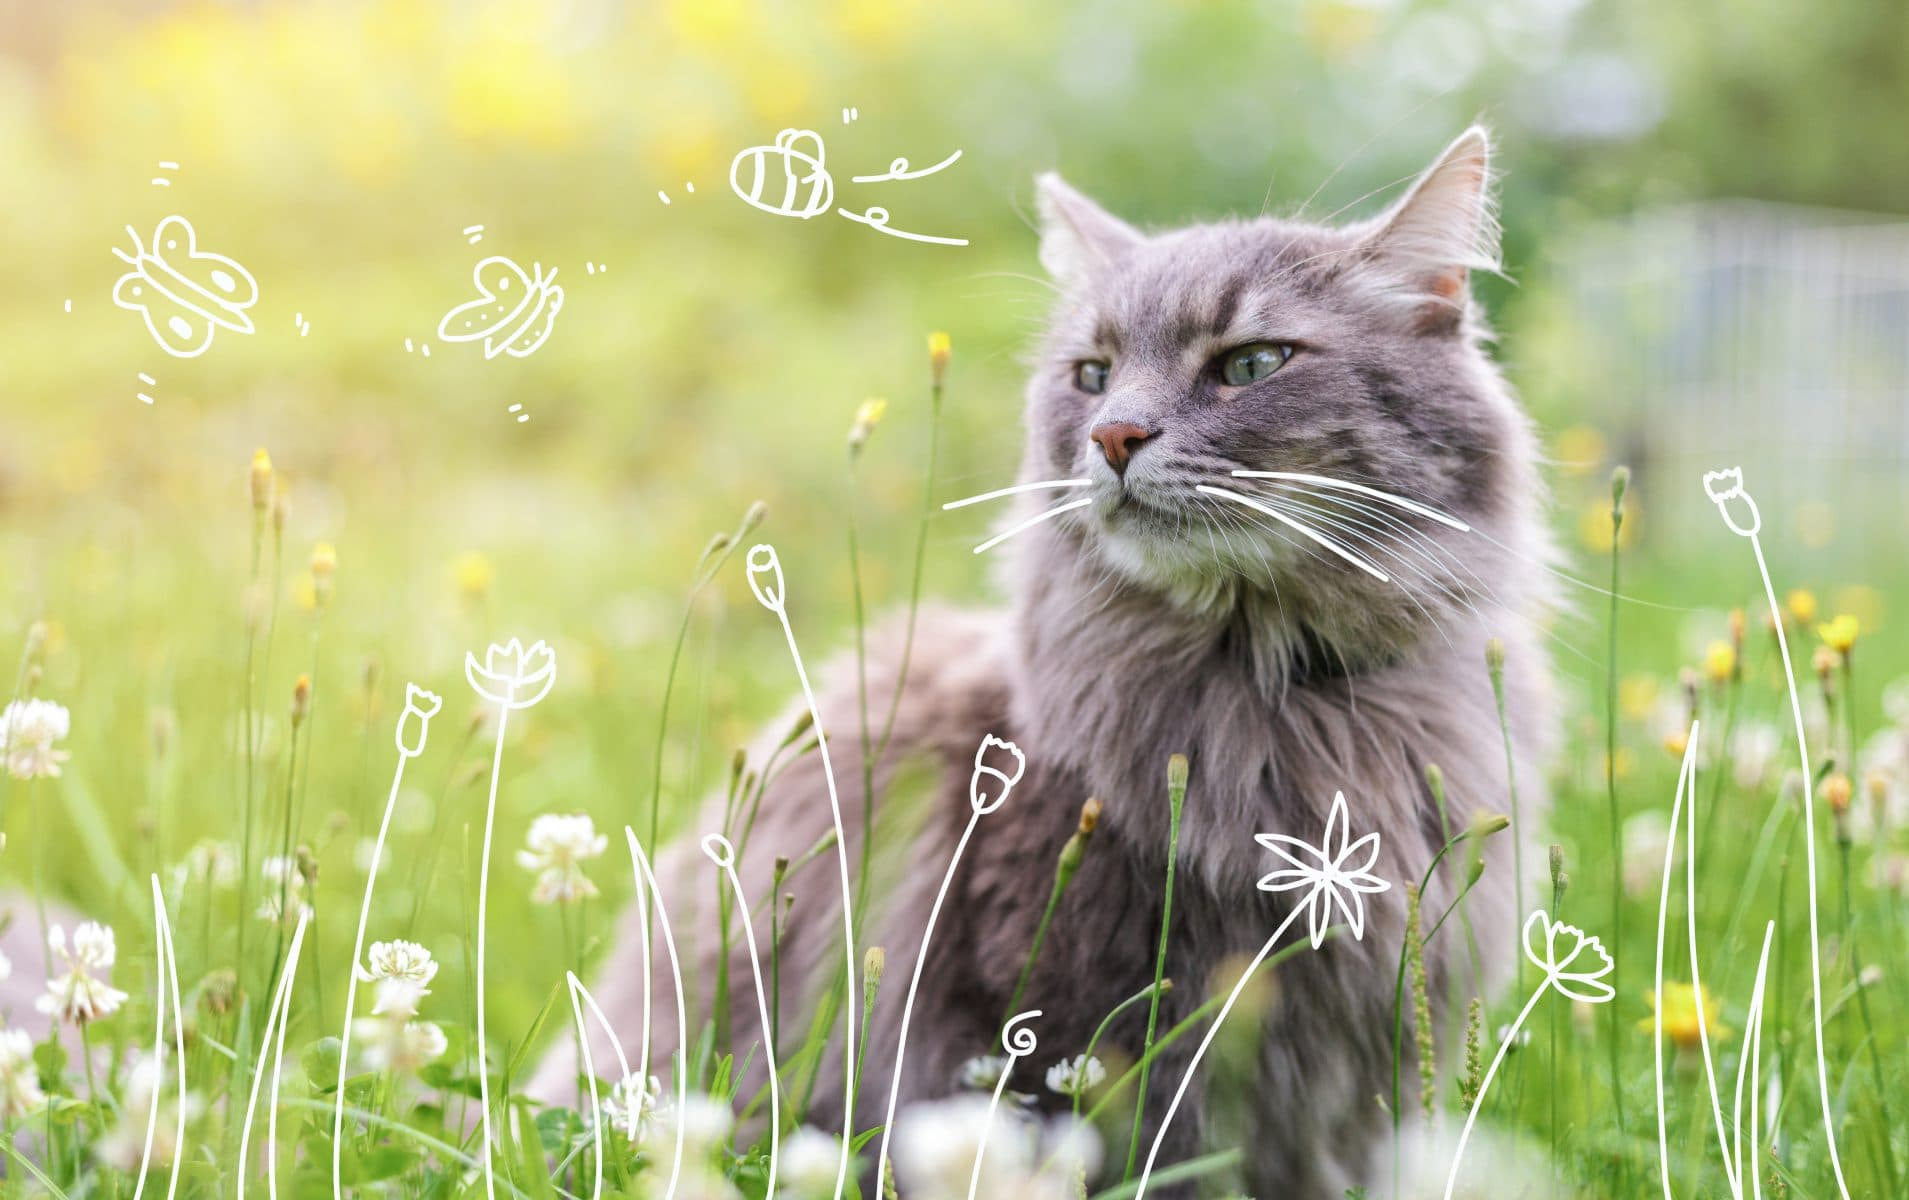 A Cat outdoors. cat diets